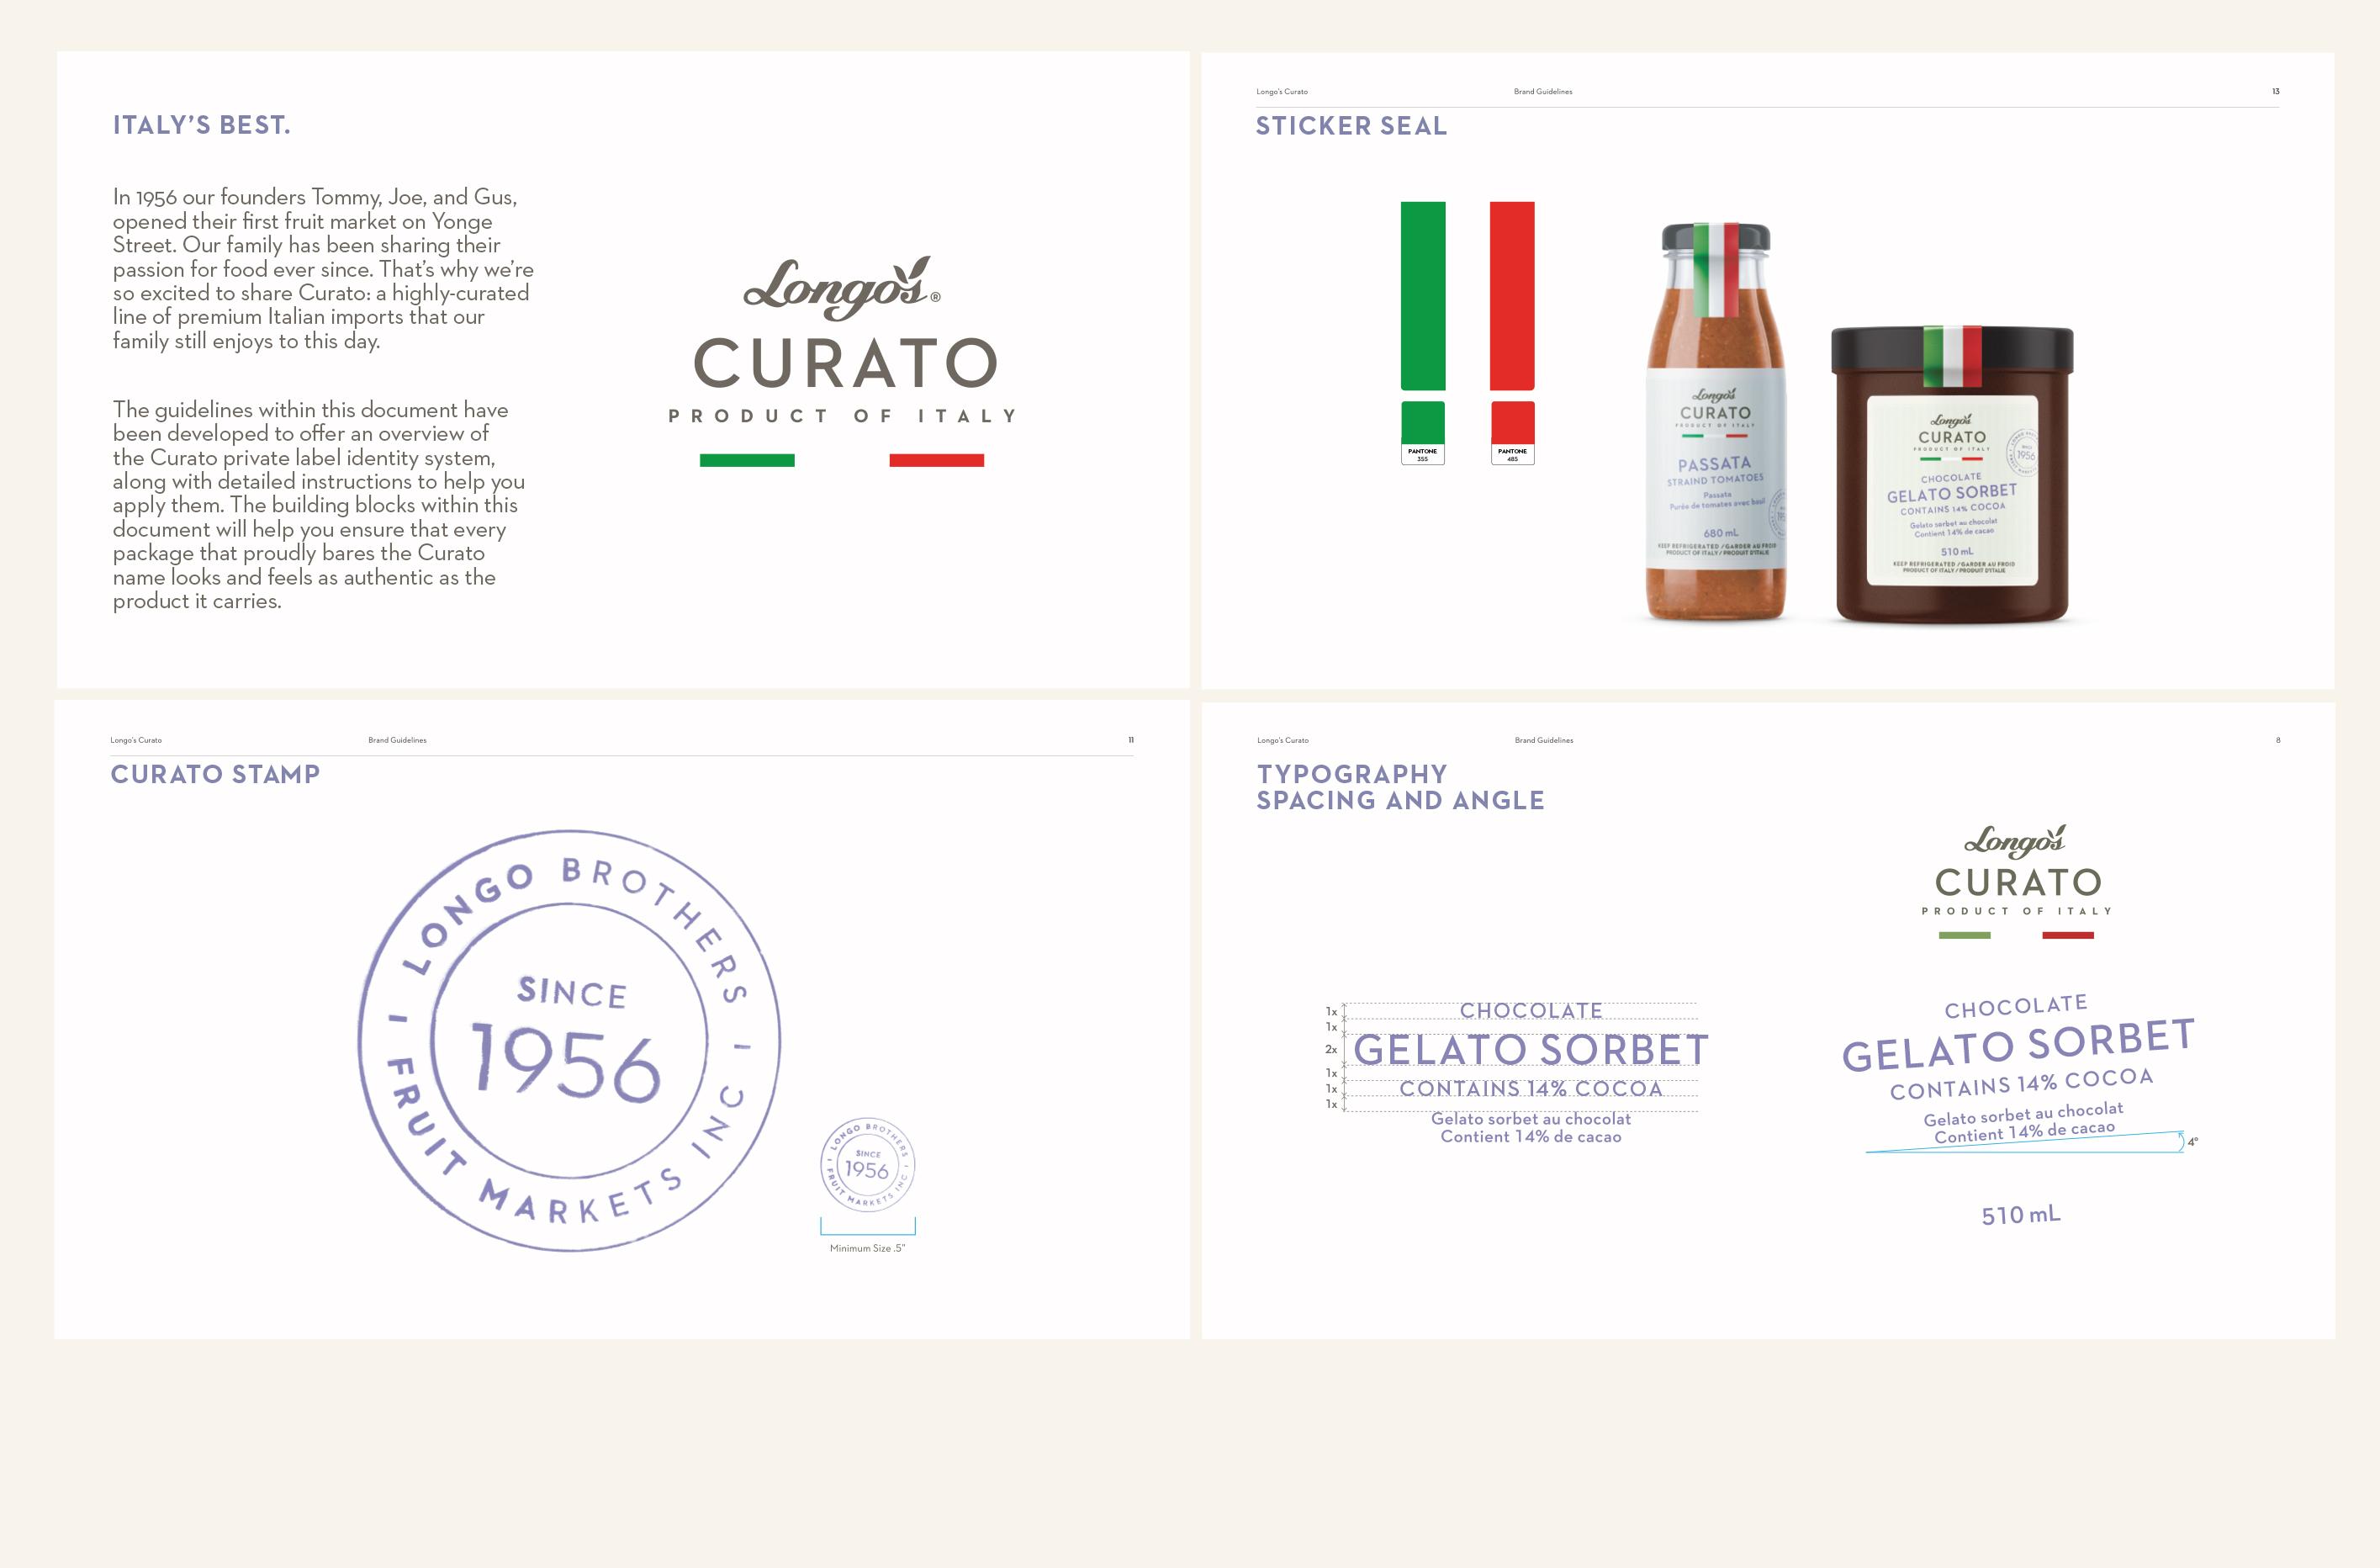 Longo's Curato Brand Guidelines